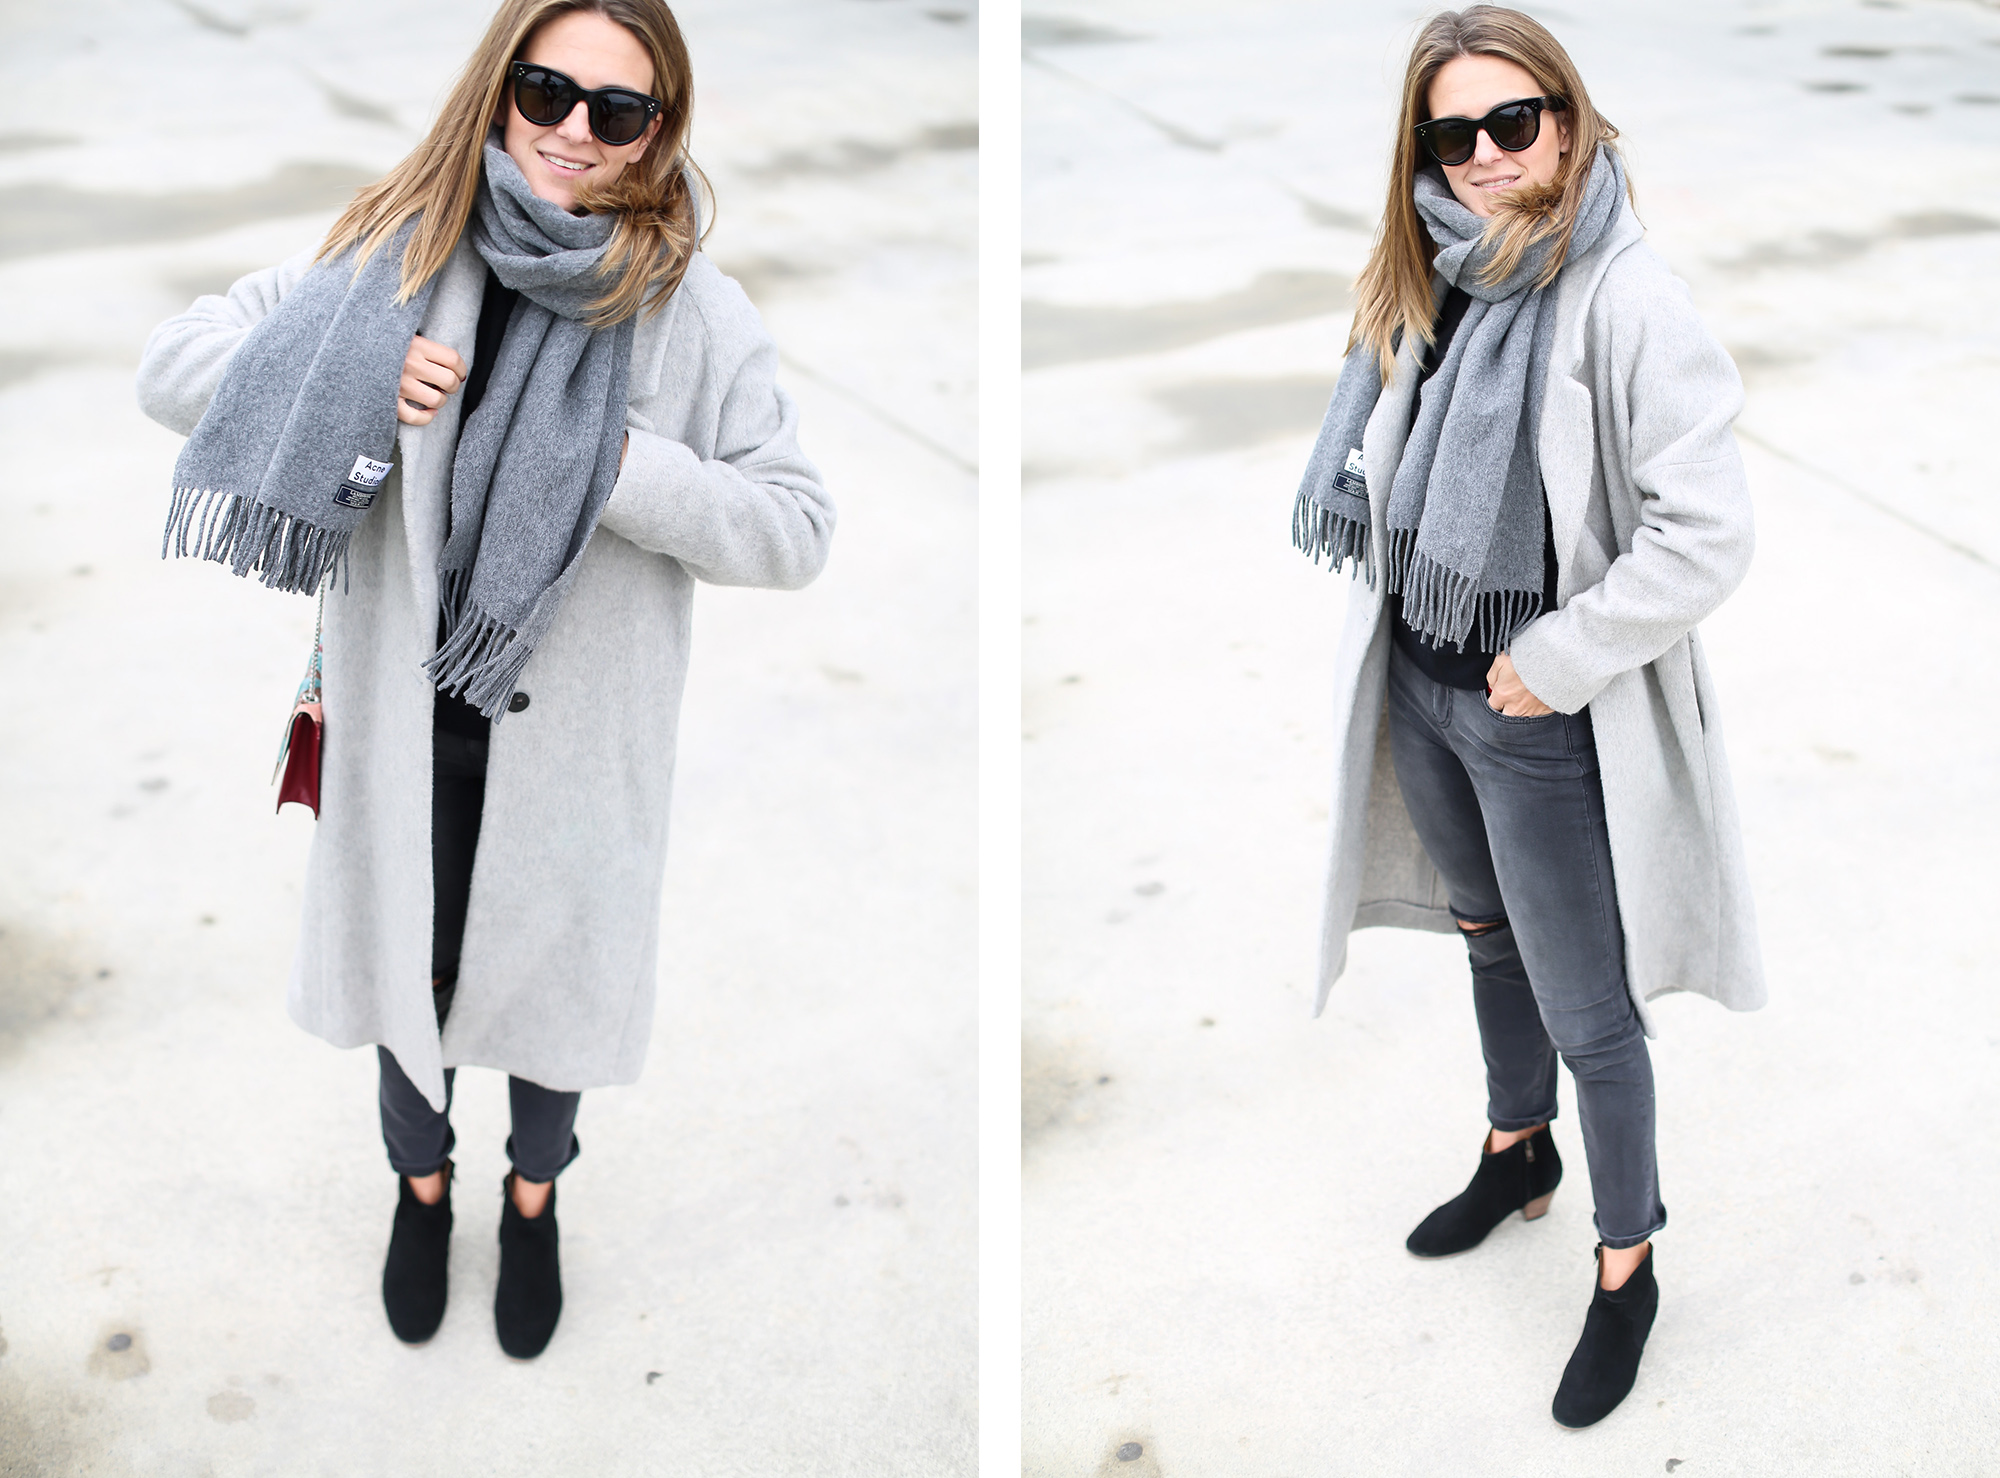 Clochet_streetstyle_fashionblogger_abrigolargogrislanamango_isabelmarantdicker_sudaderalazoclaudiepierlot-8